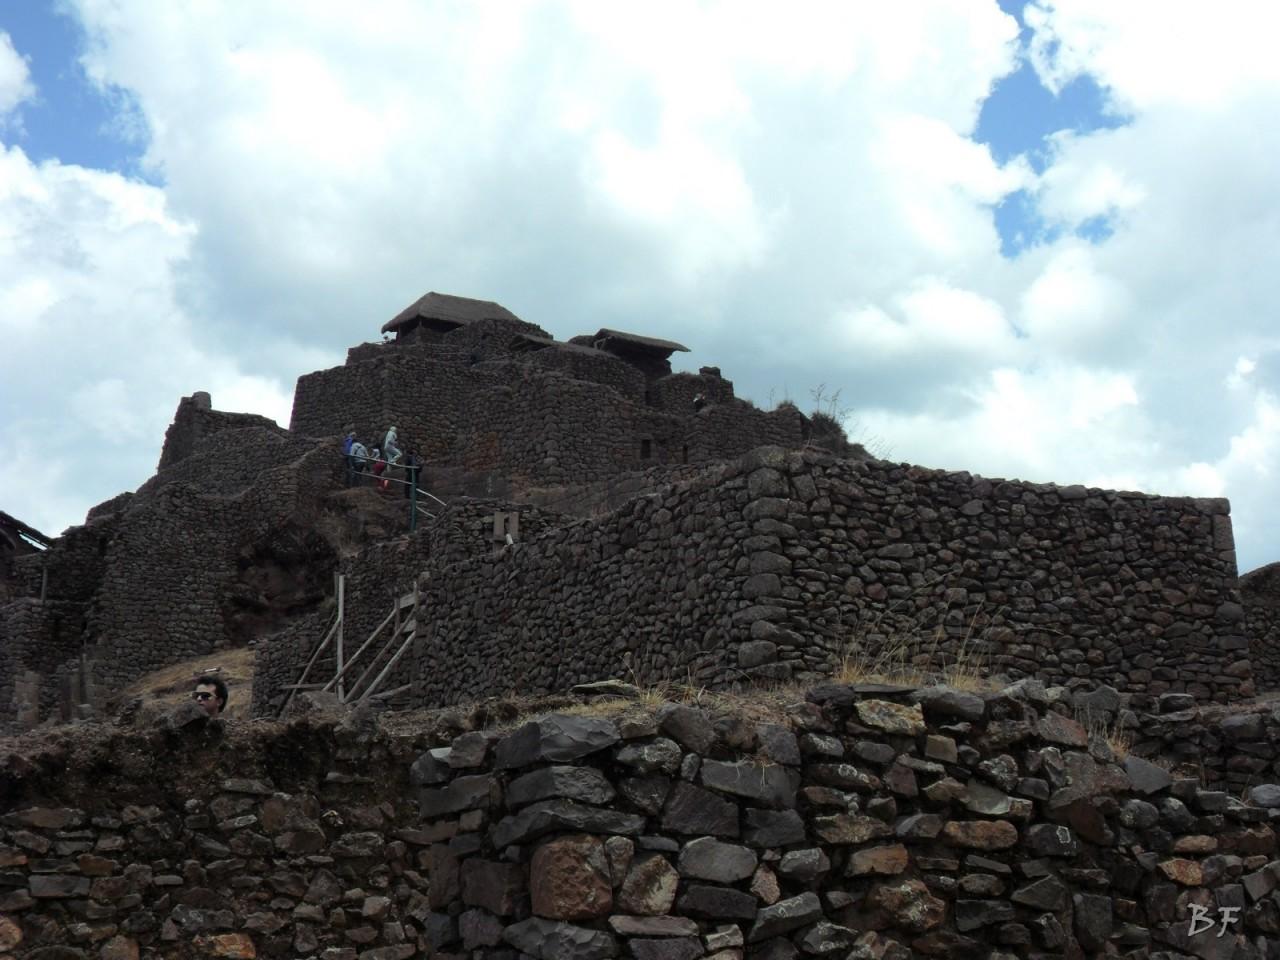 Mura-Poligonali-Megaliti-Altari-Rupestri-Pisac-Cusco-Perù-15